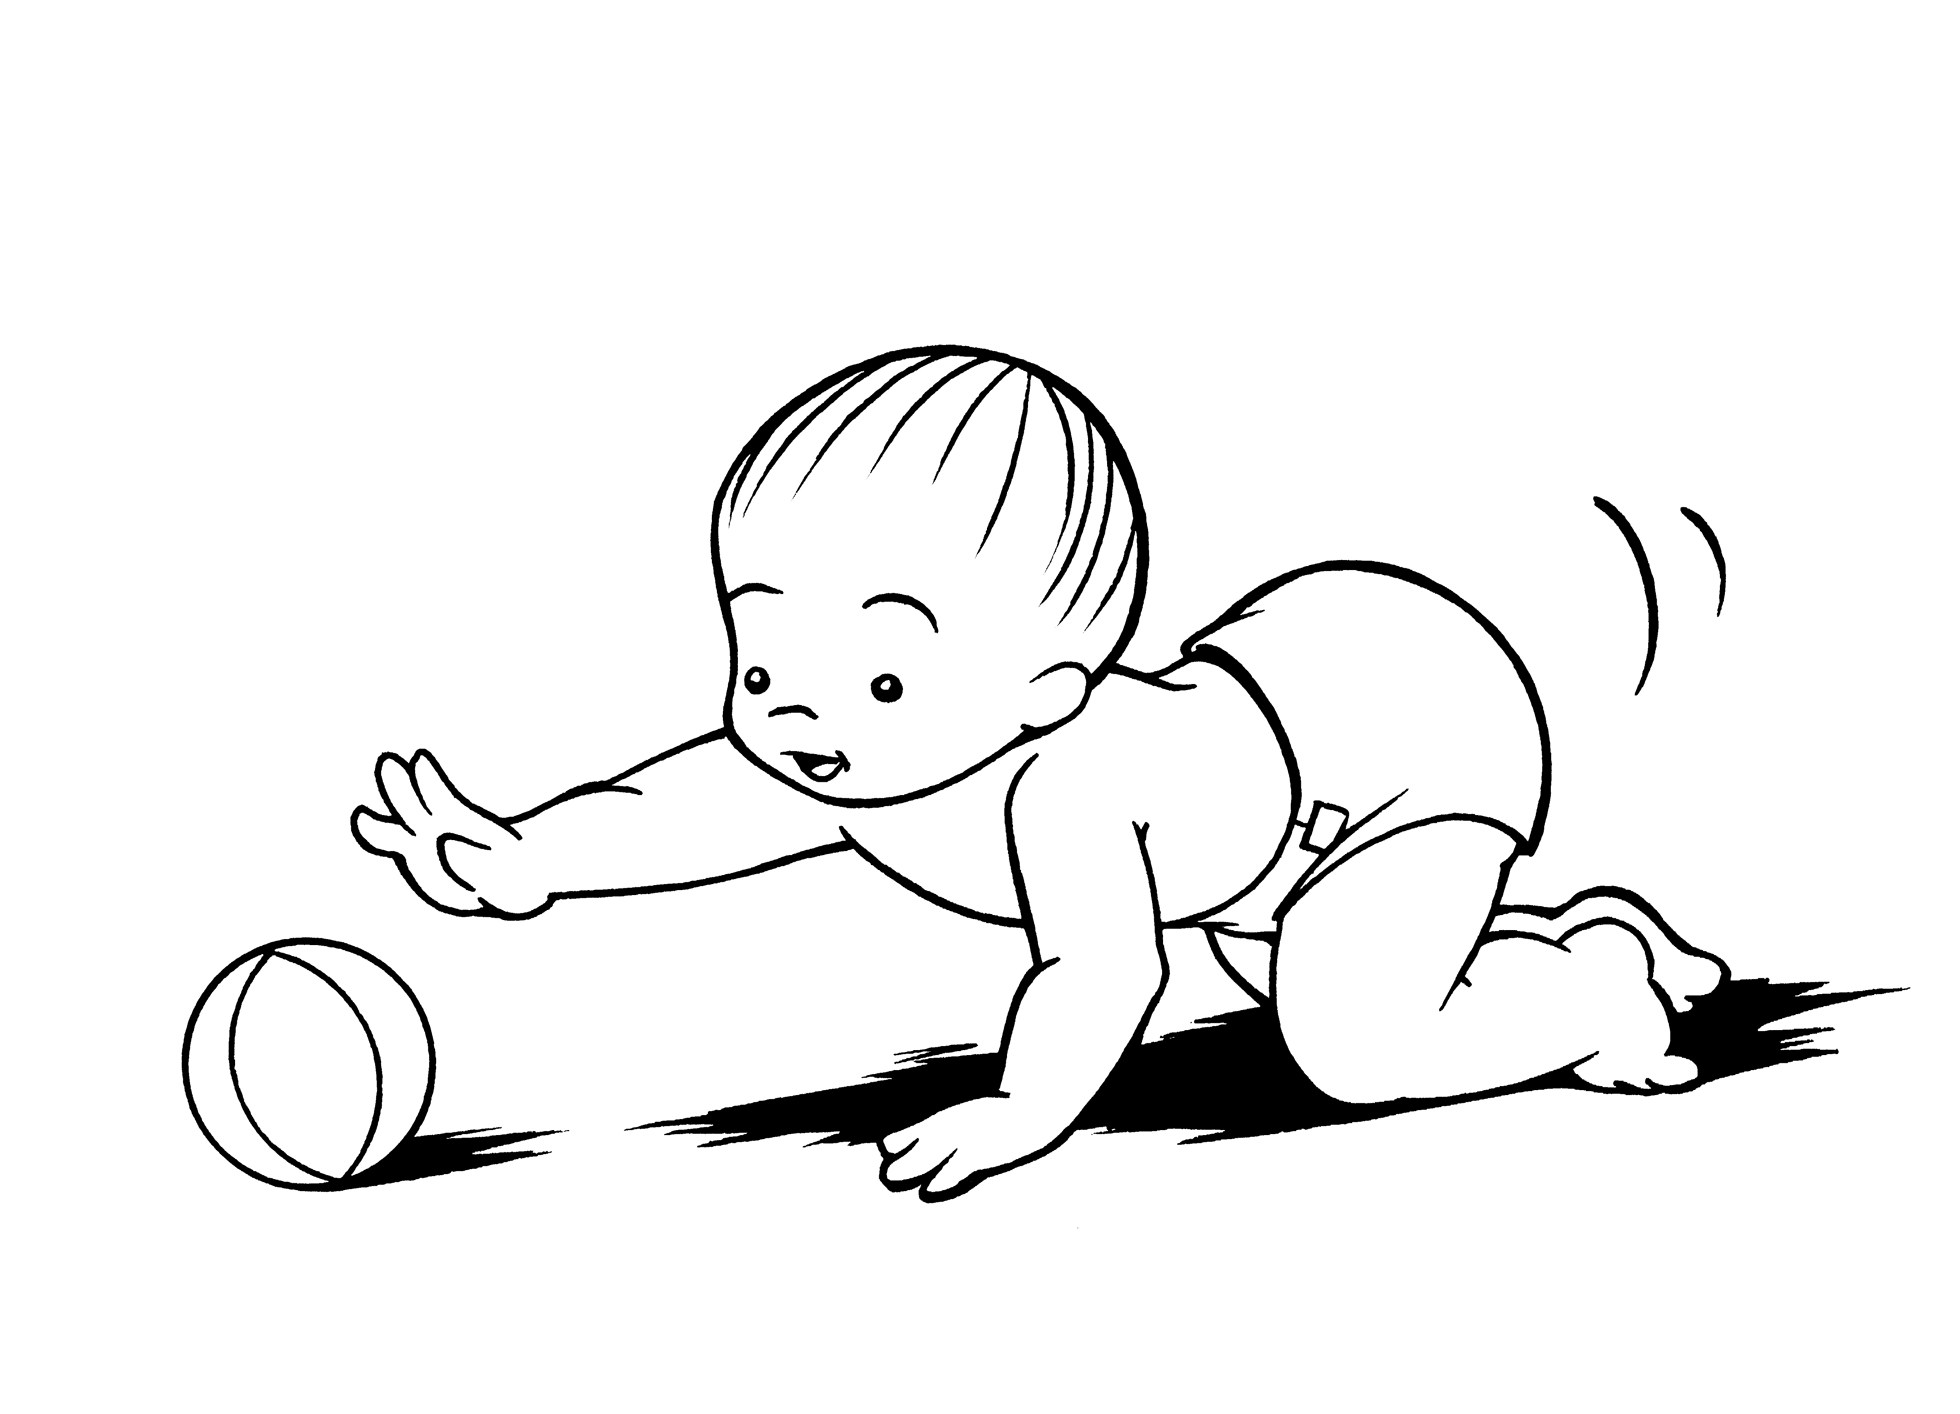 Crawling coloring #14, Download drawings